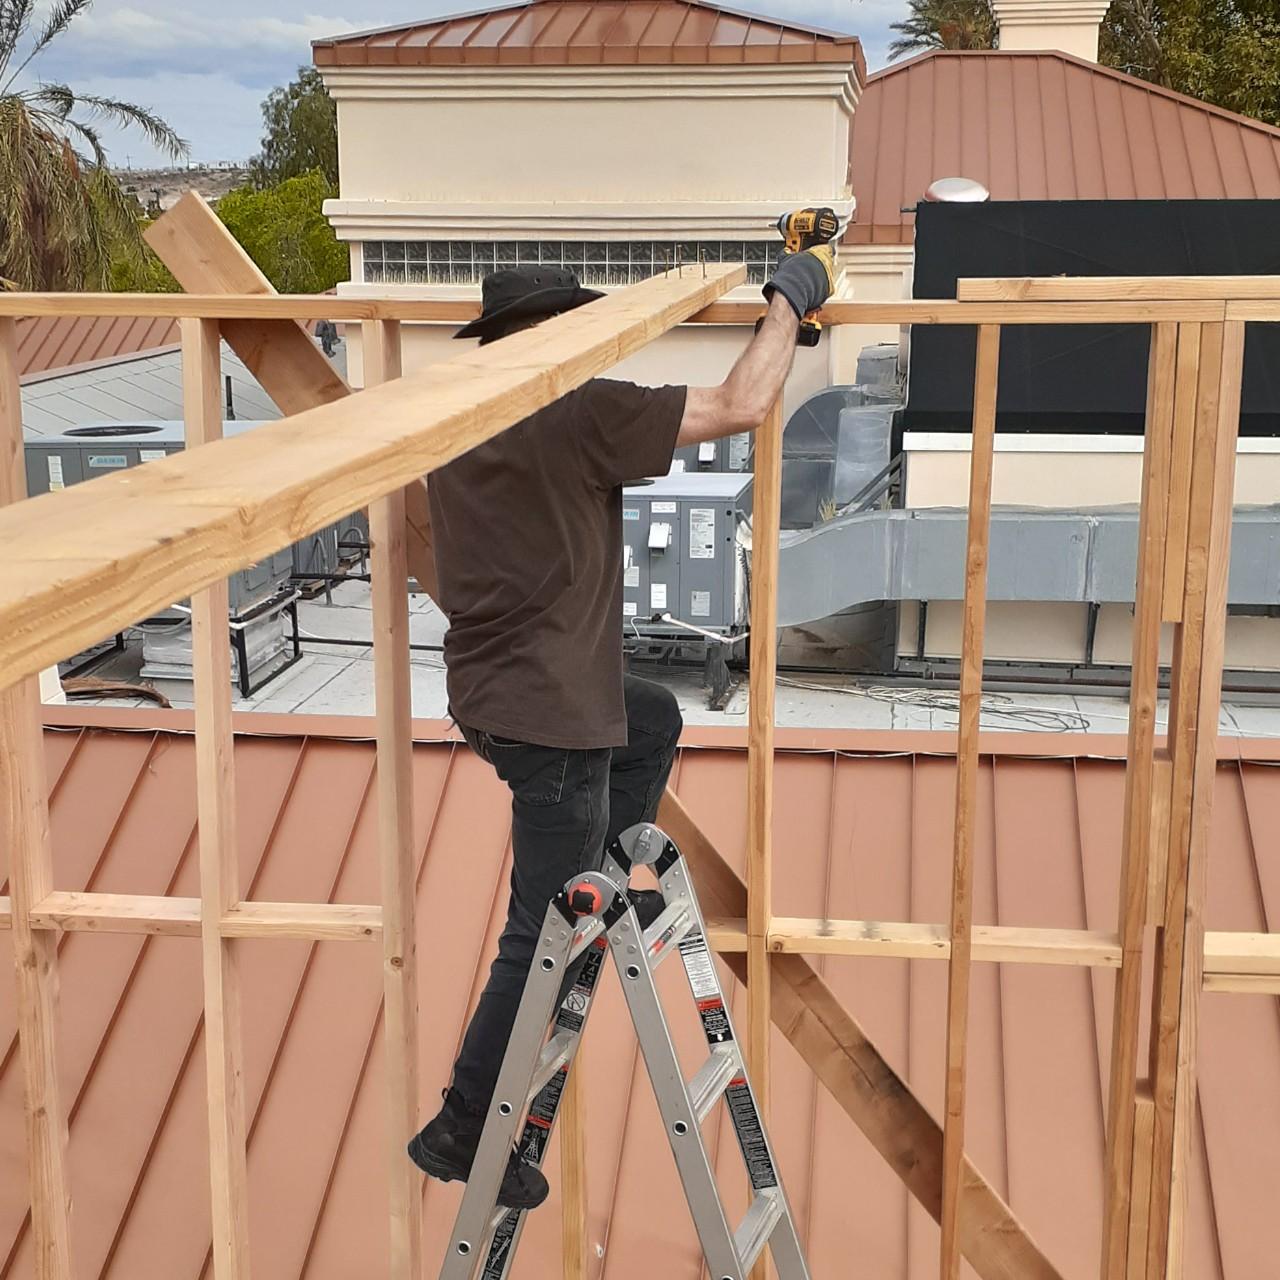 carpentry-wood-framing-second-floor-home-addition--framing-00